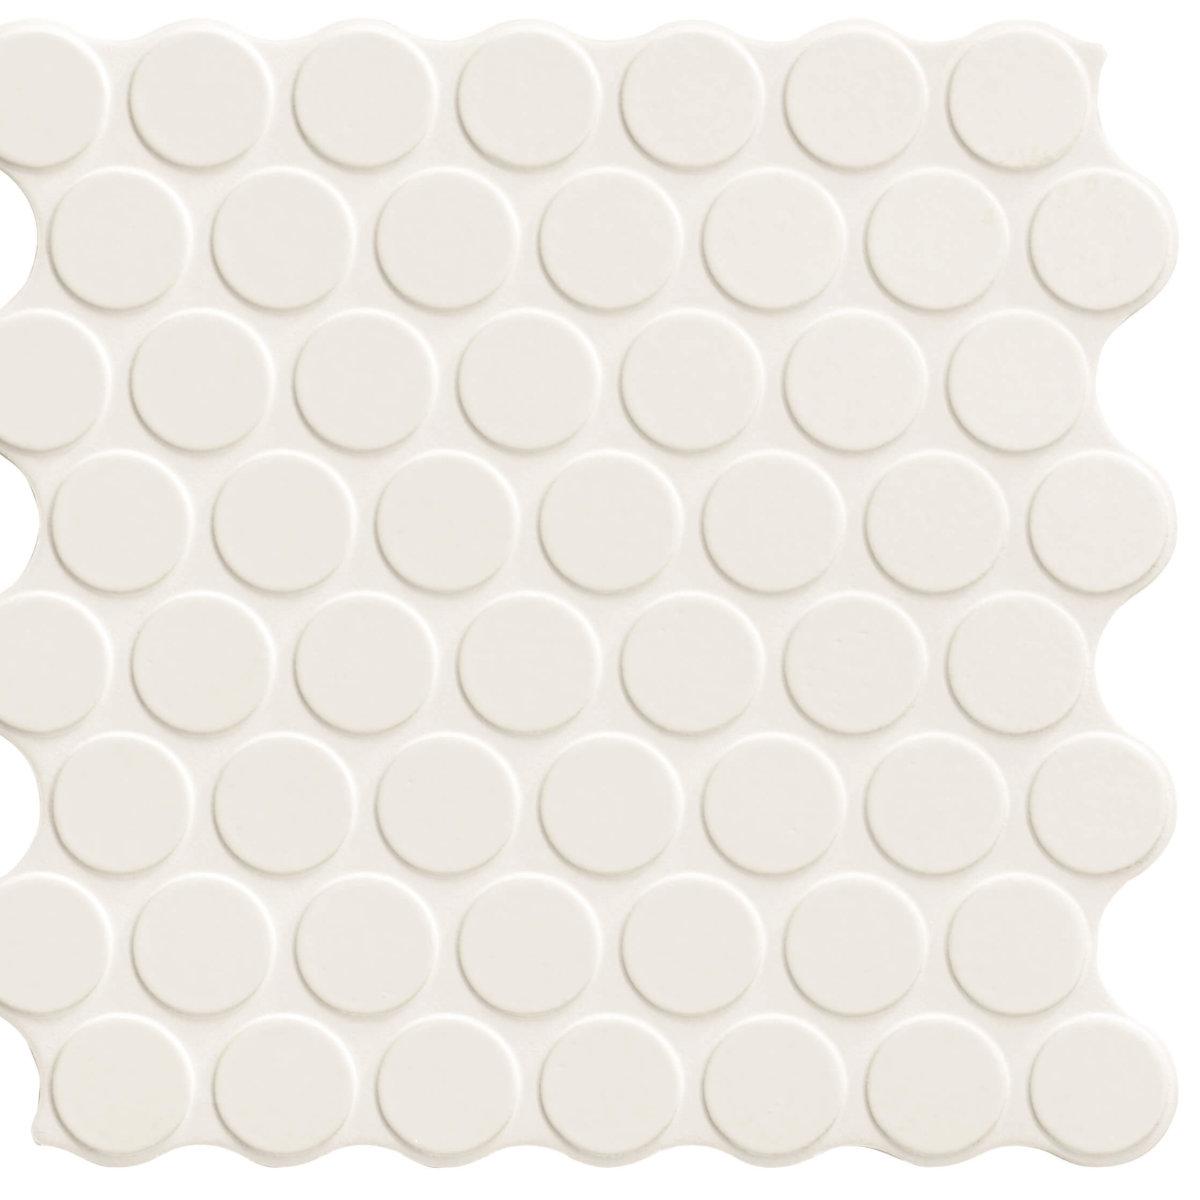 Circle White 309x309mm_Stiles_Product_Image